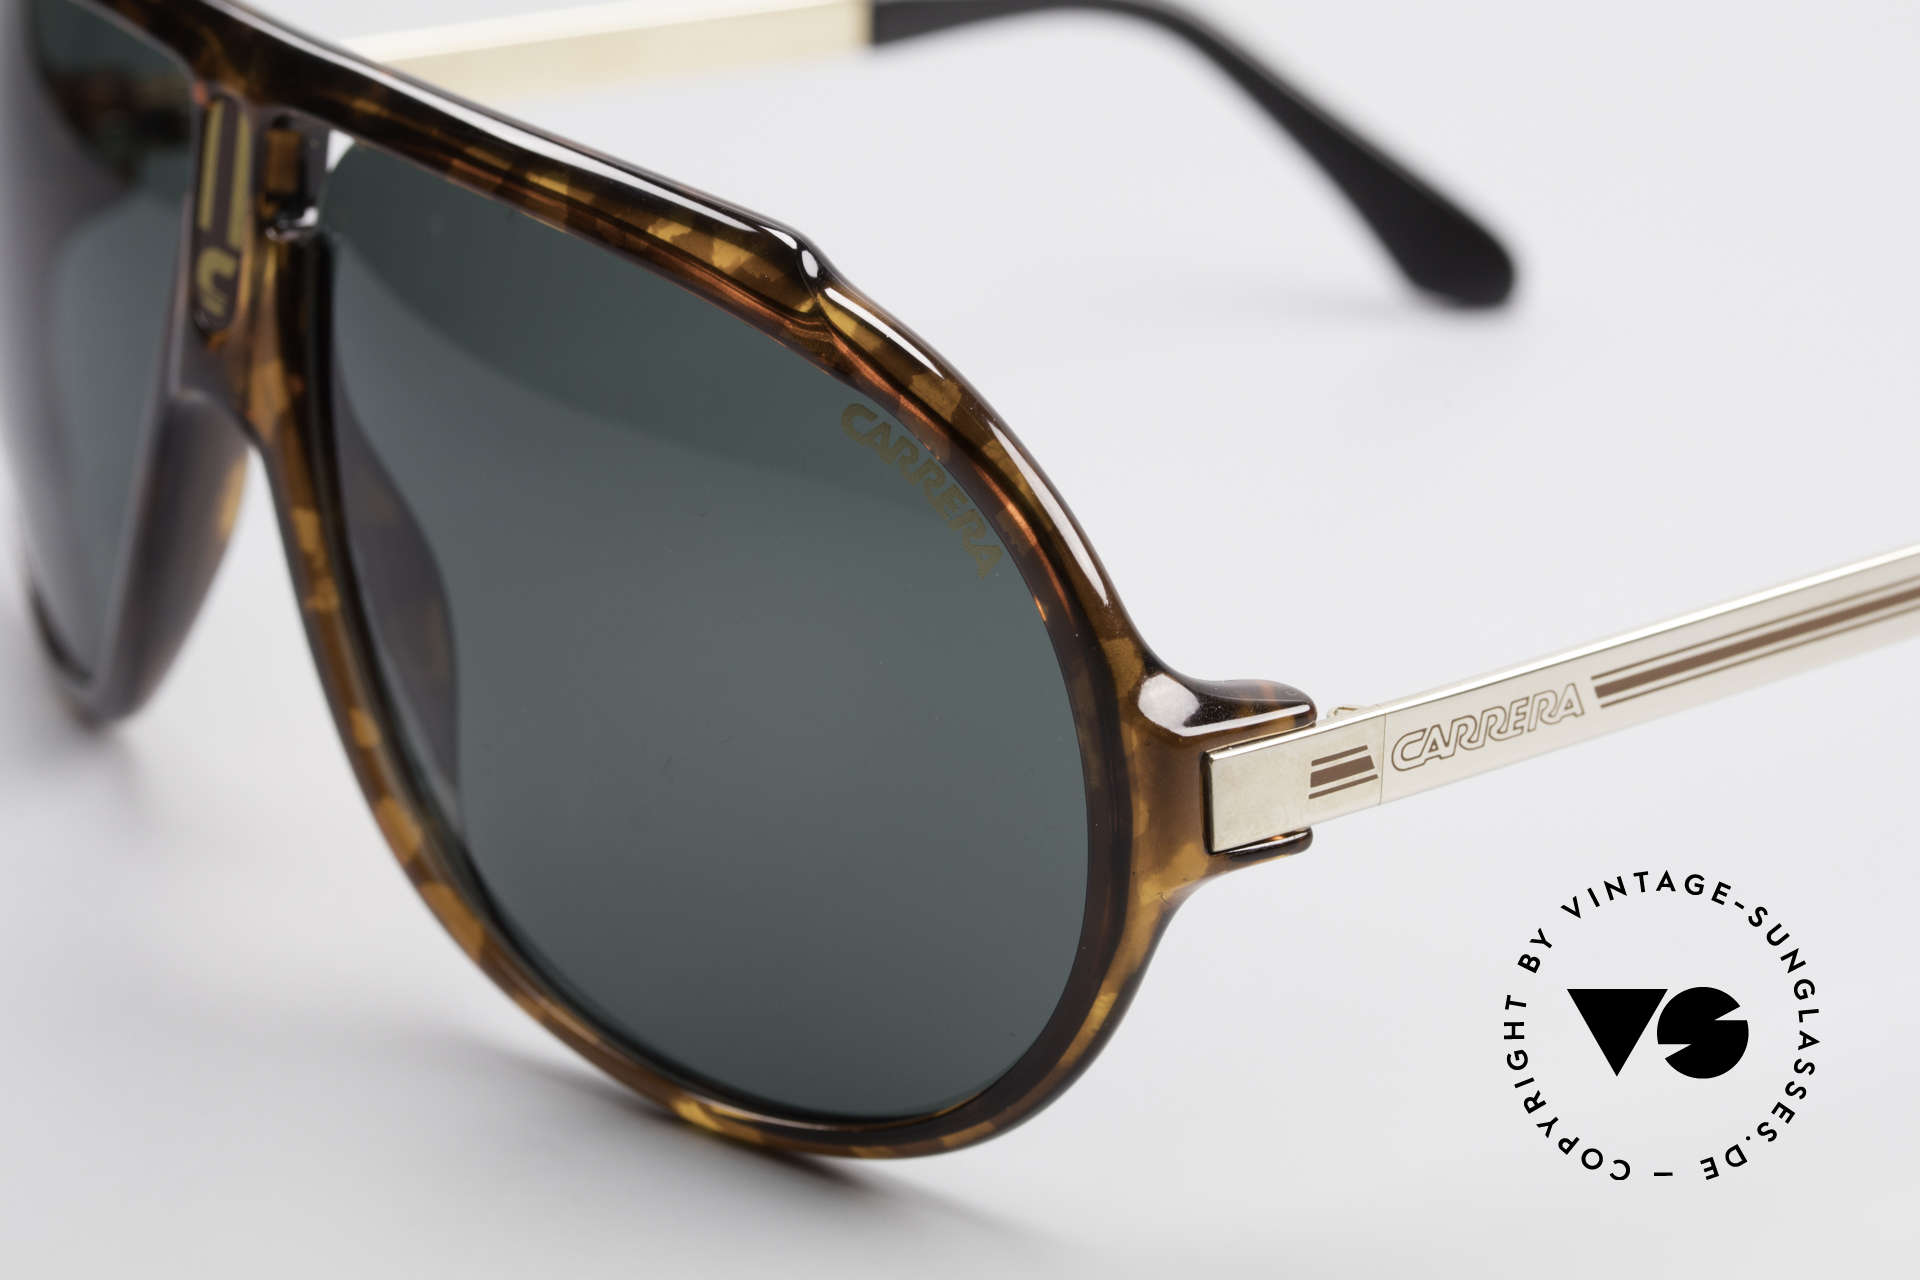 Carrera 5512 80's Sunglasses Don Johnson, unworn rarity with dark green Carrera lenses (100% UV), Made for Men